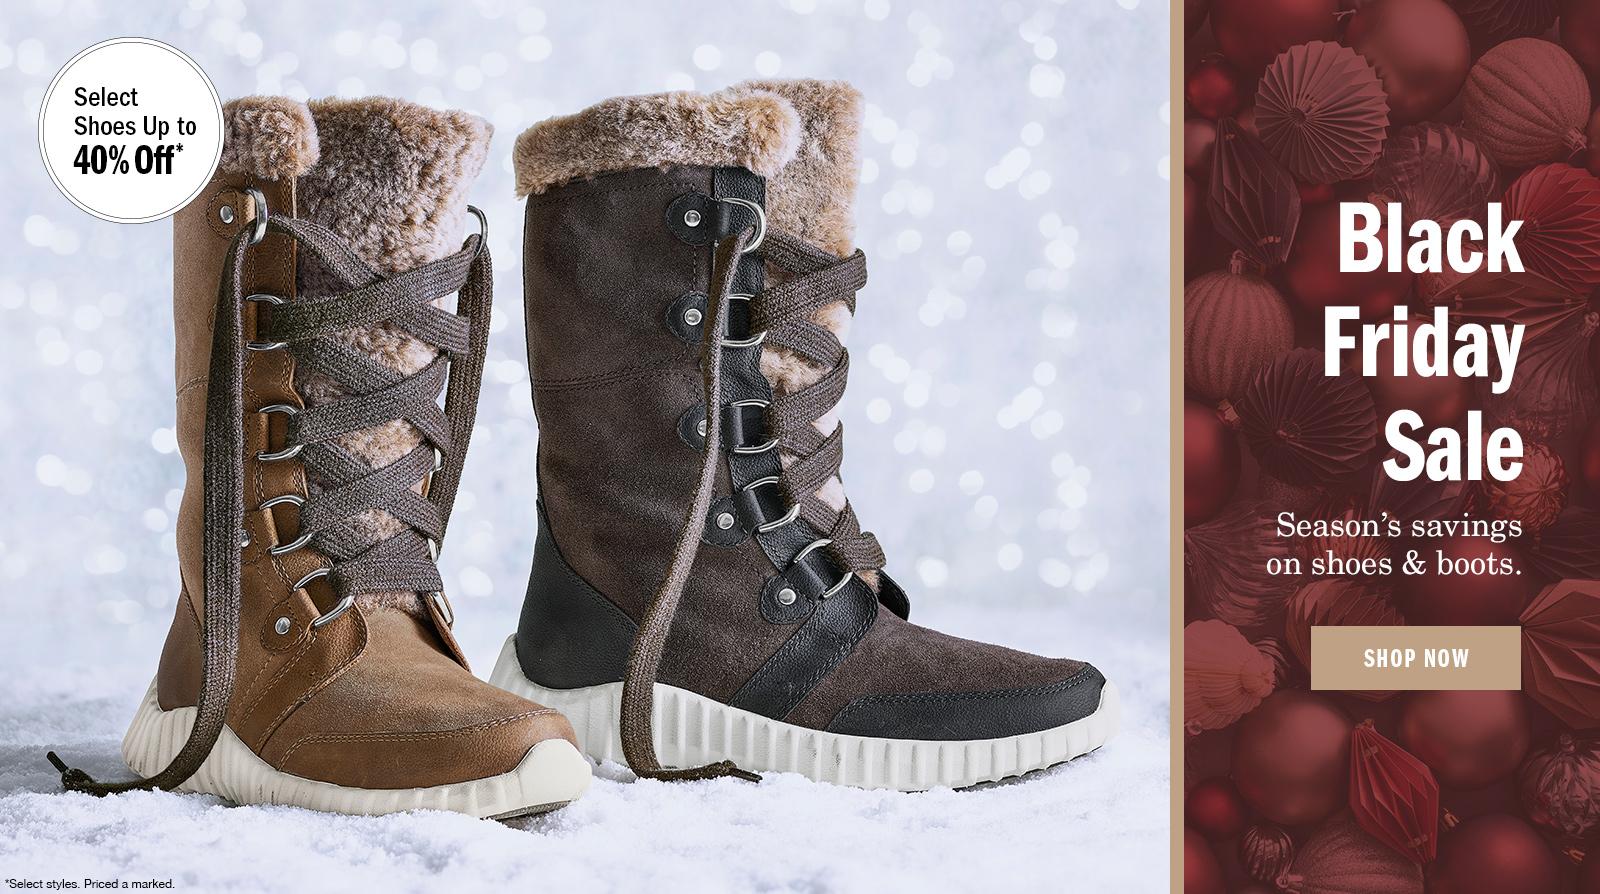 Black Friday Sale Women's Boots